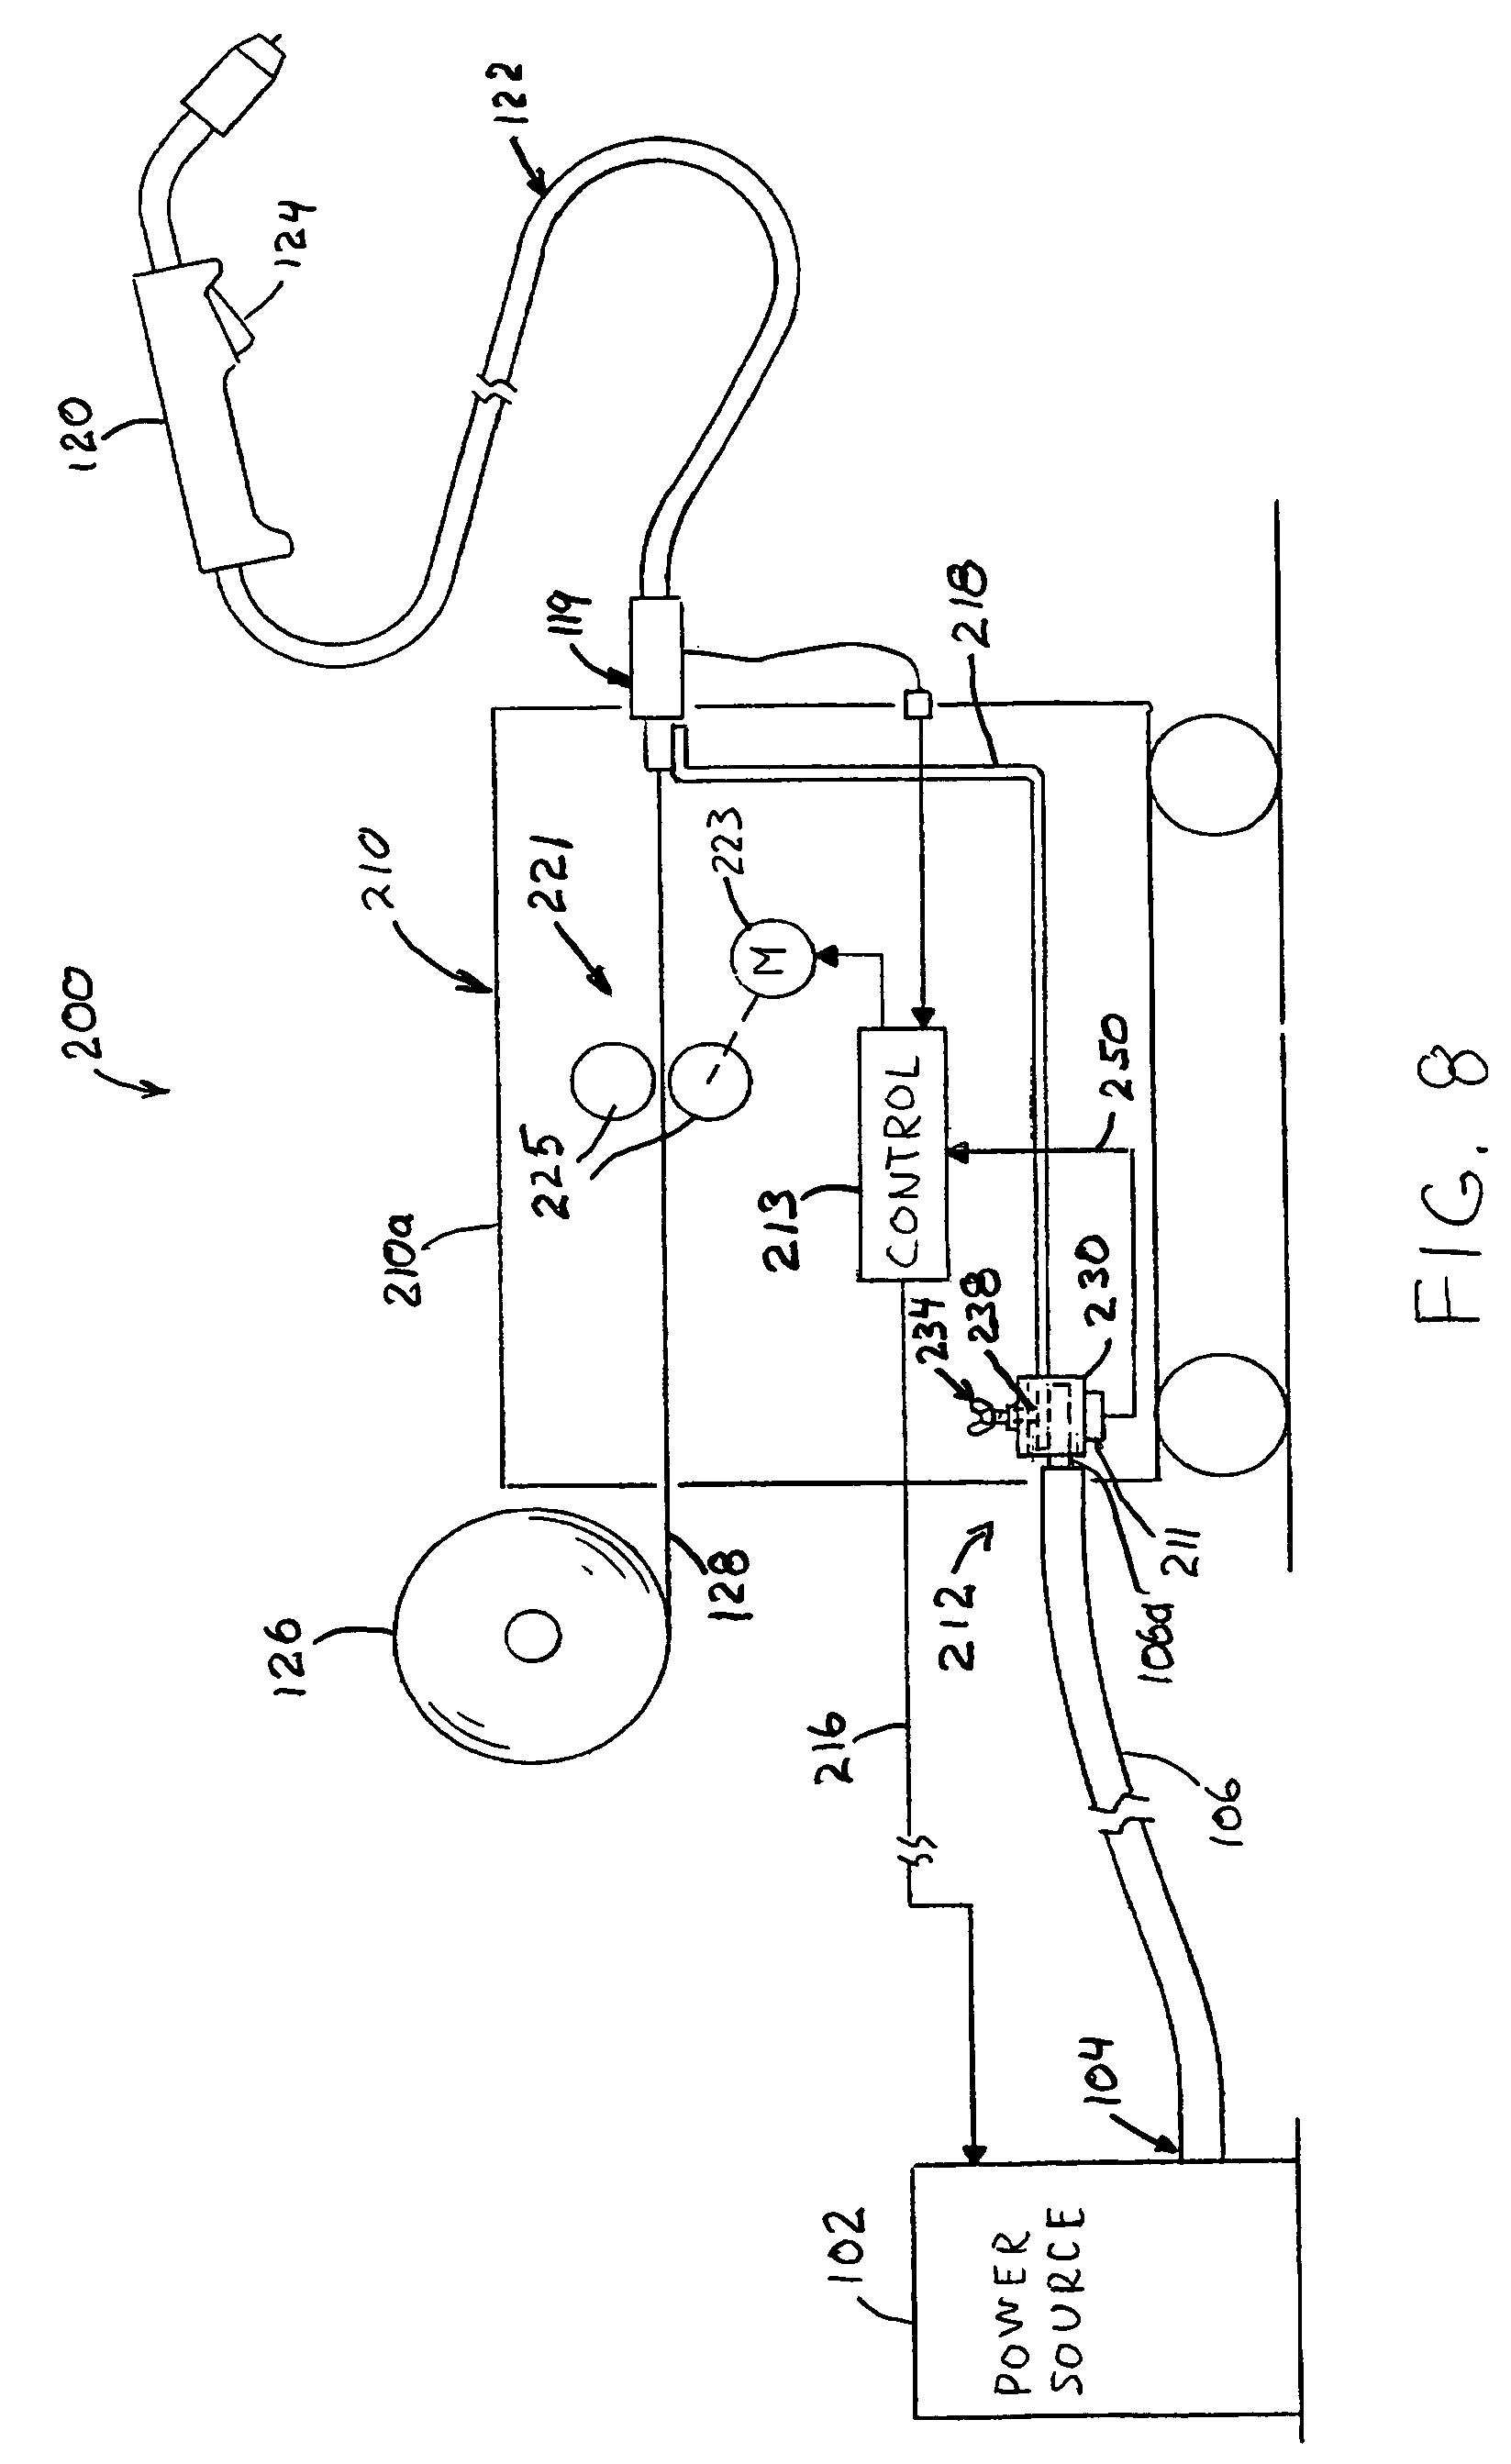 Rewiring A Utility Trailer, Rewiring, Free Engine Image